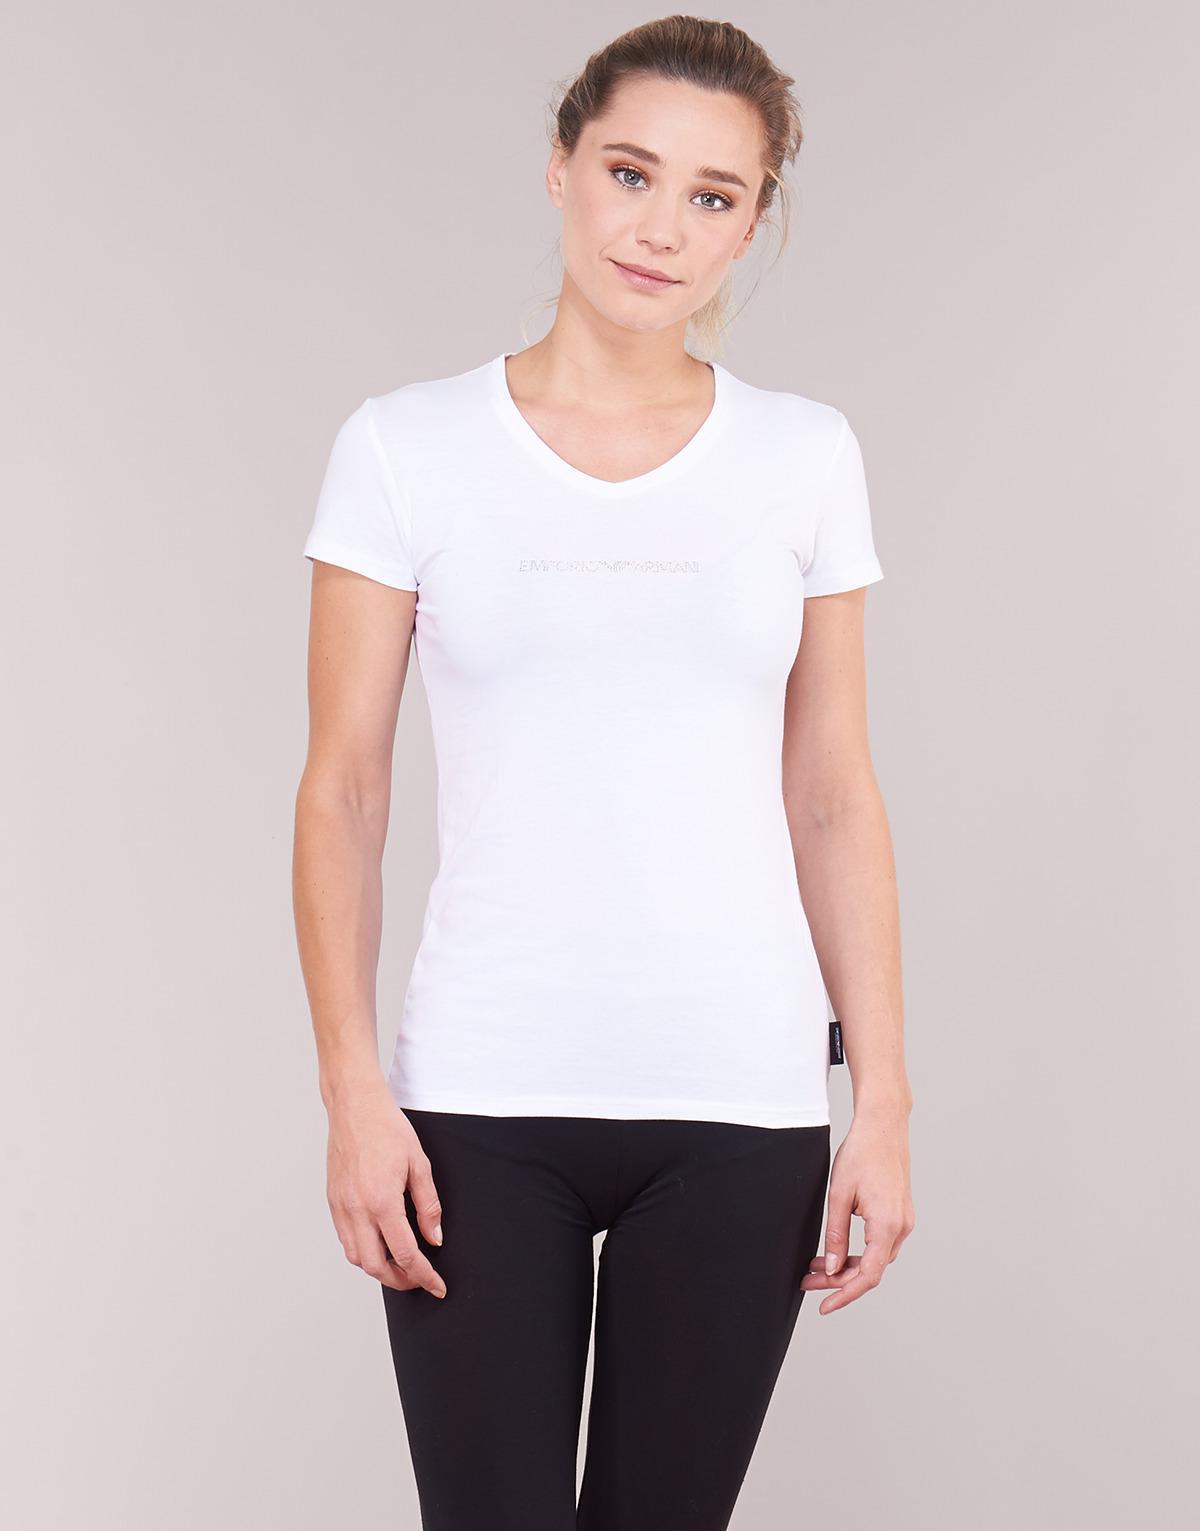 7e2ee0f52a11 Emporio Armani Cc317-163321-00010 Women's T Shirt In White in White - Lyst